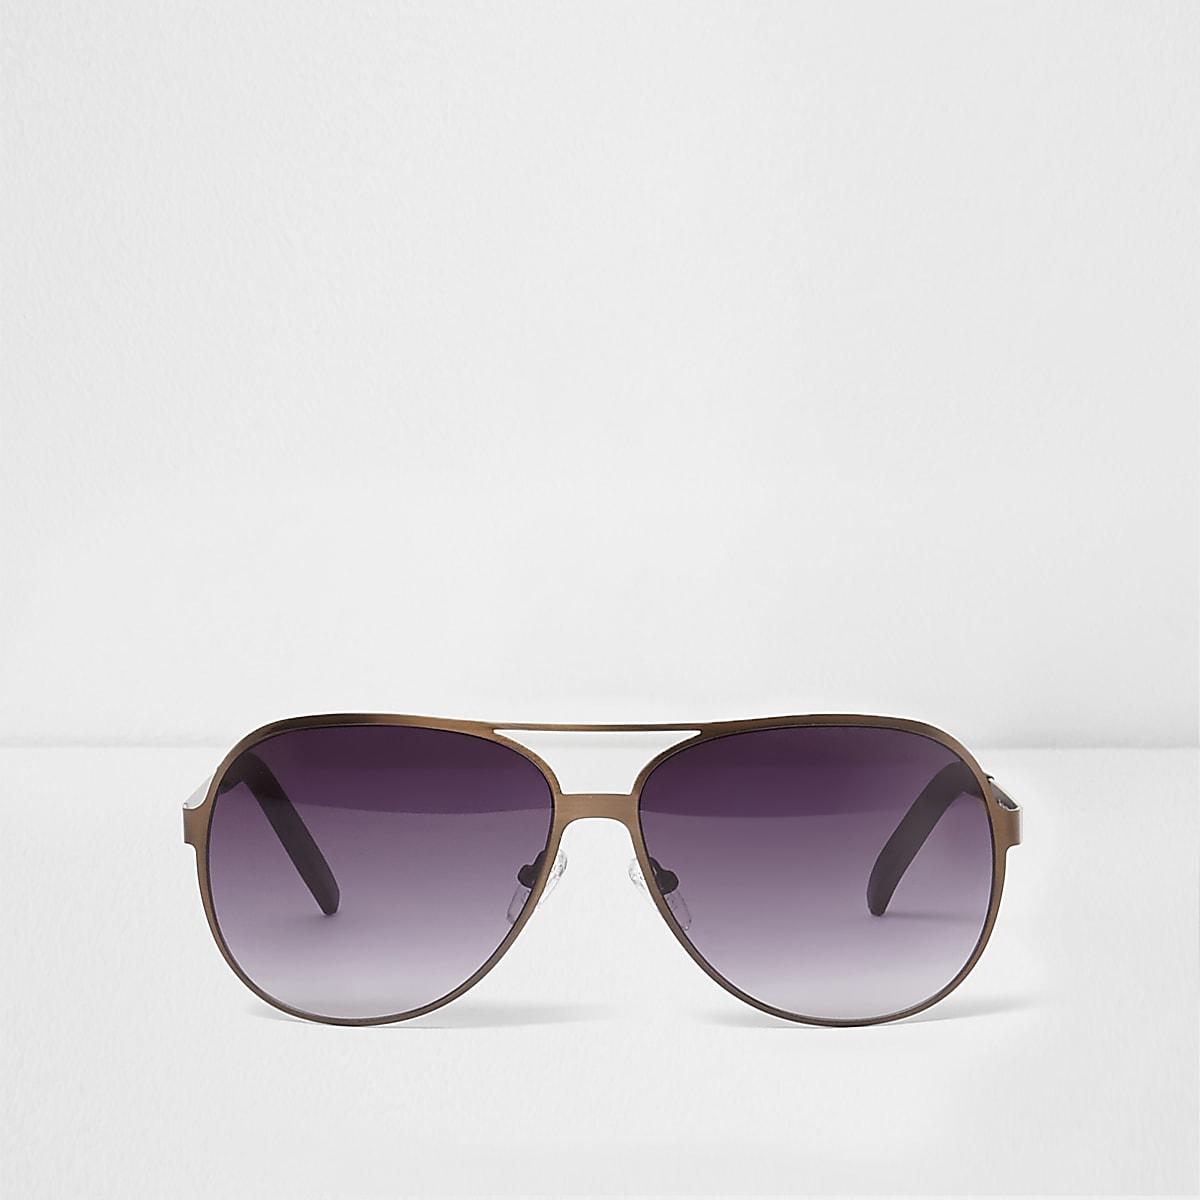 Bronze tone aviator sunglasses